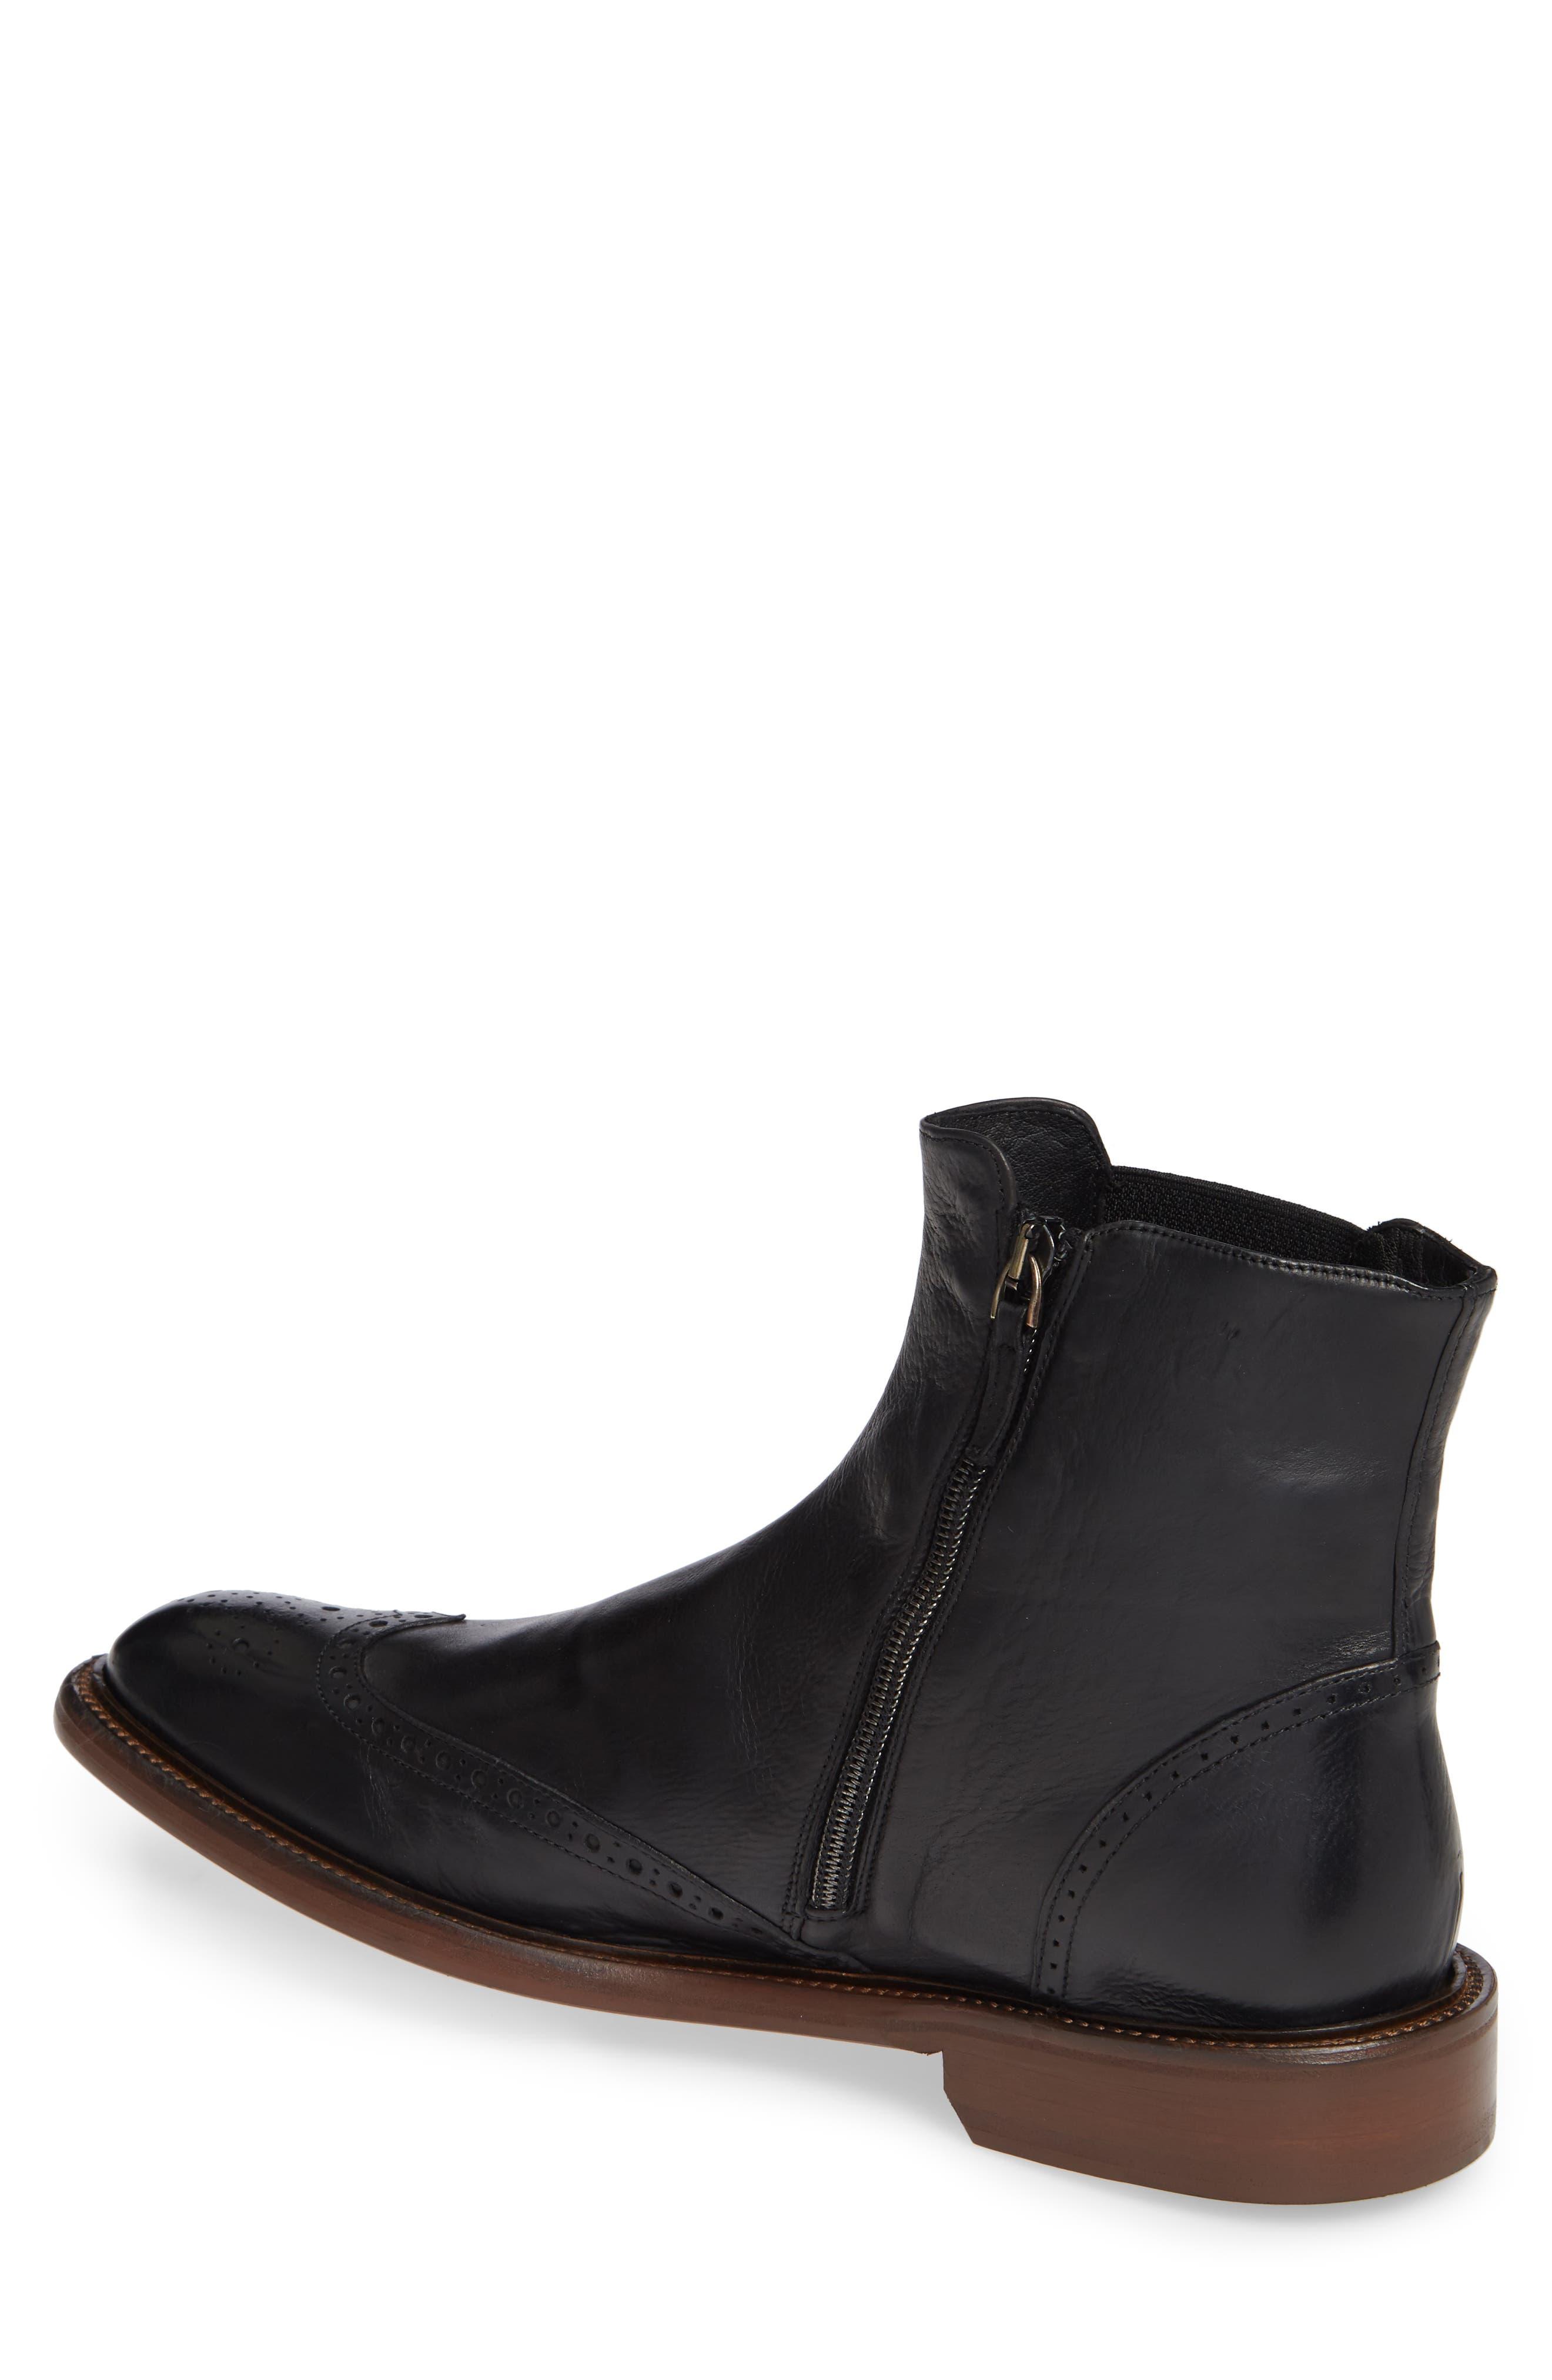 Bryson Wingtip Chelsea Boot,                             Alternate thumbnail 2, color,                             BLACK LEATHER